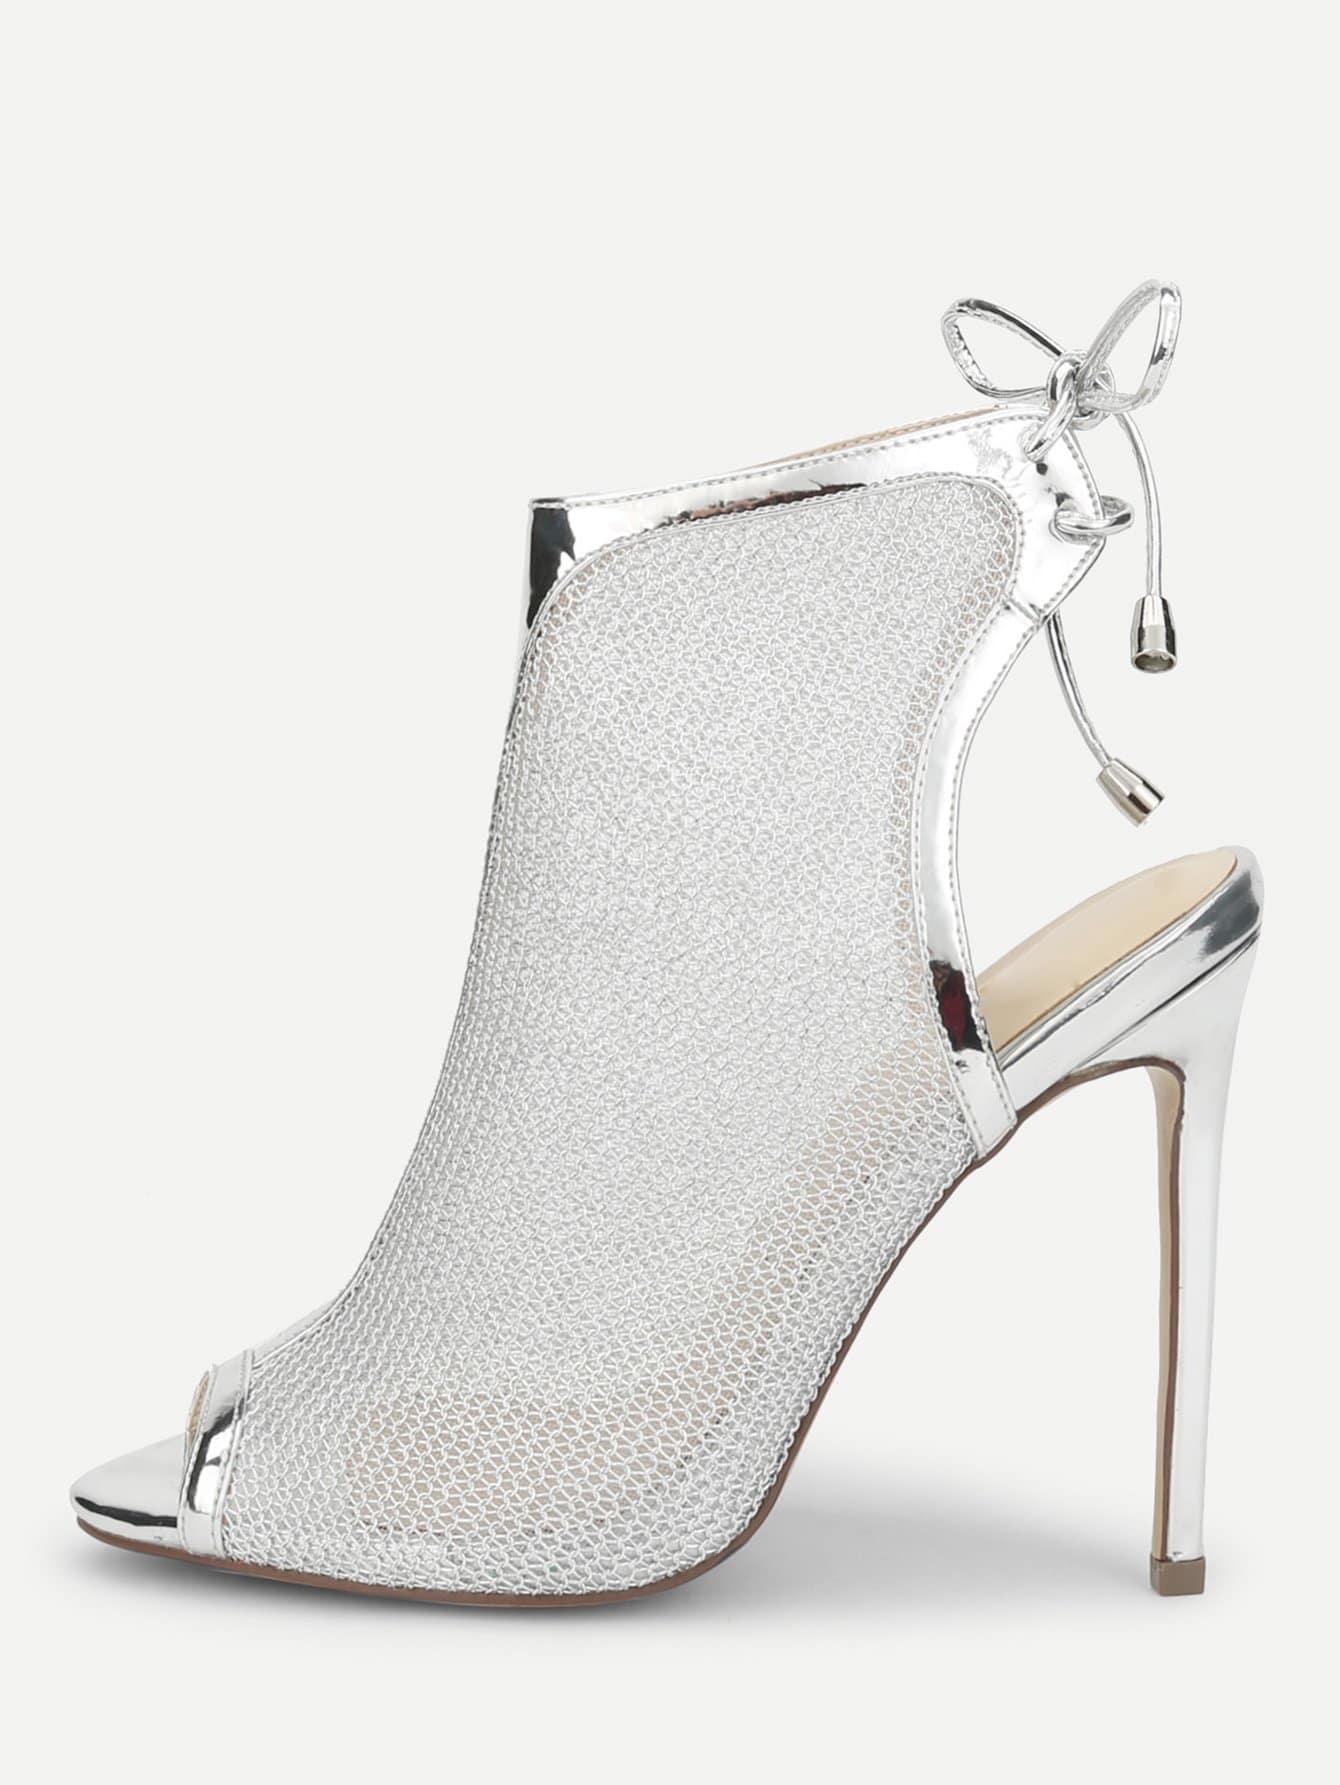 Фото Peep Toe Mesh High Heeled Sandals